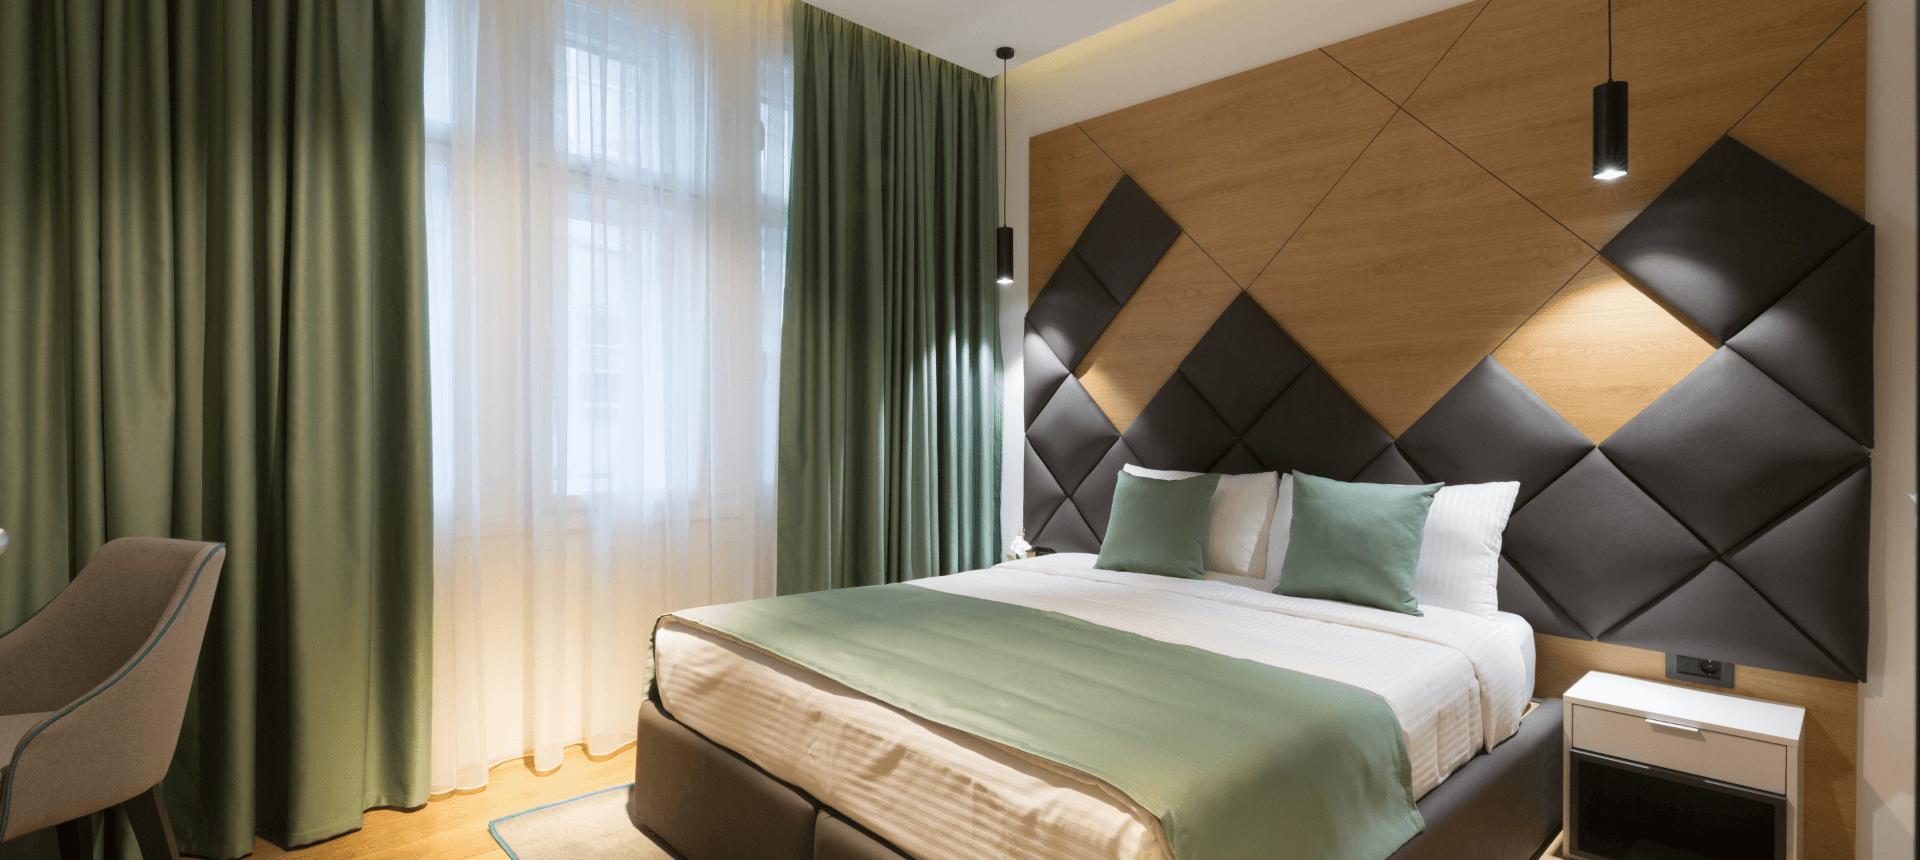 photo chambre hotel